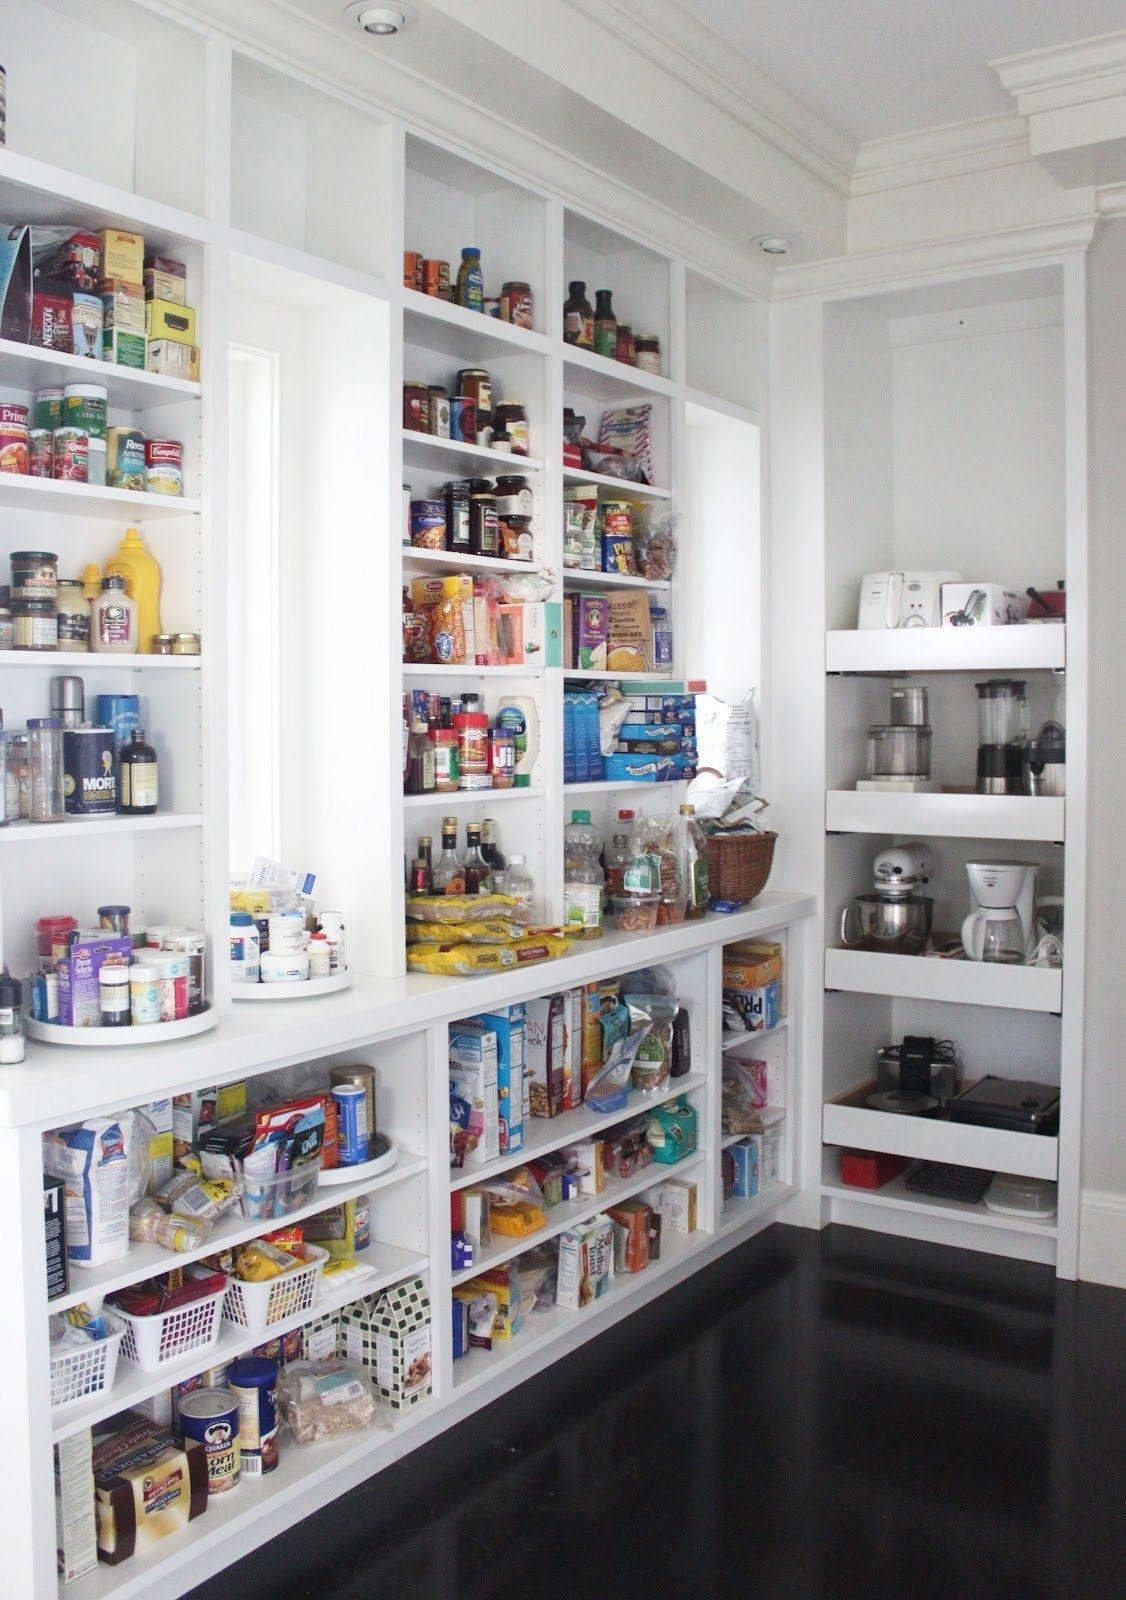 10 Ideal Walk In Pantry Shelving Ideas bold design walk in pantry shelving modest ideas plans shelves ideas 2020